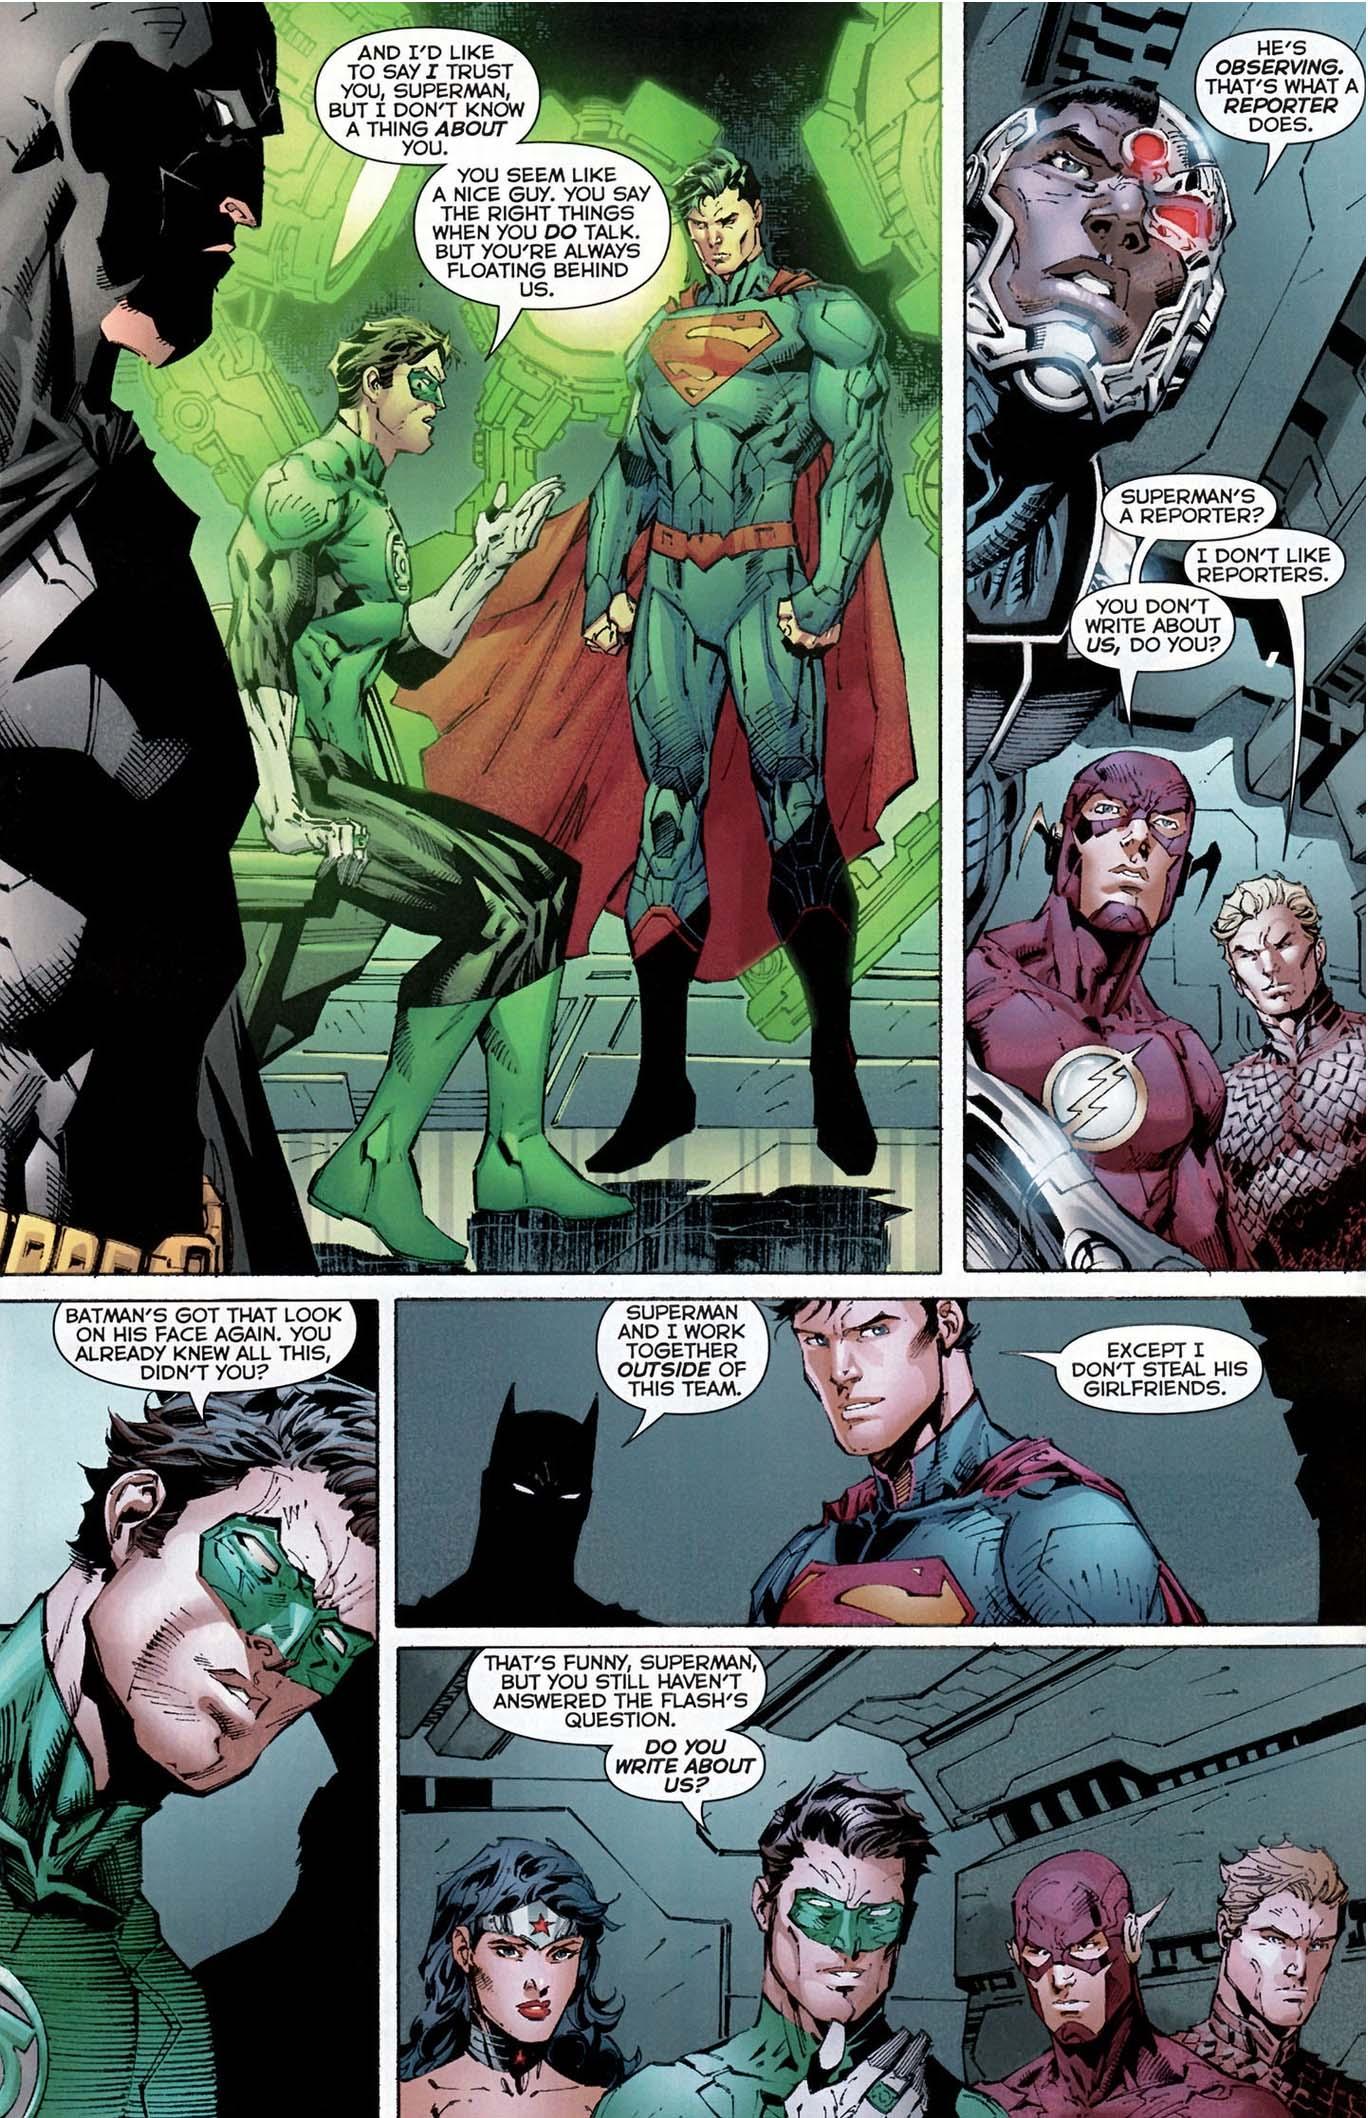 superman doesn't steal girlfriends